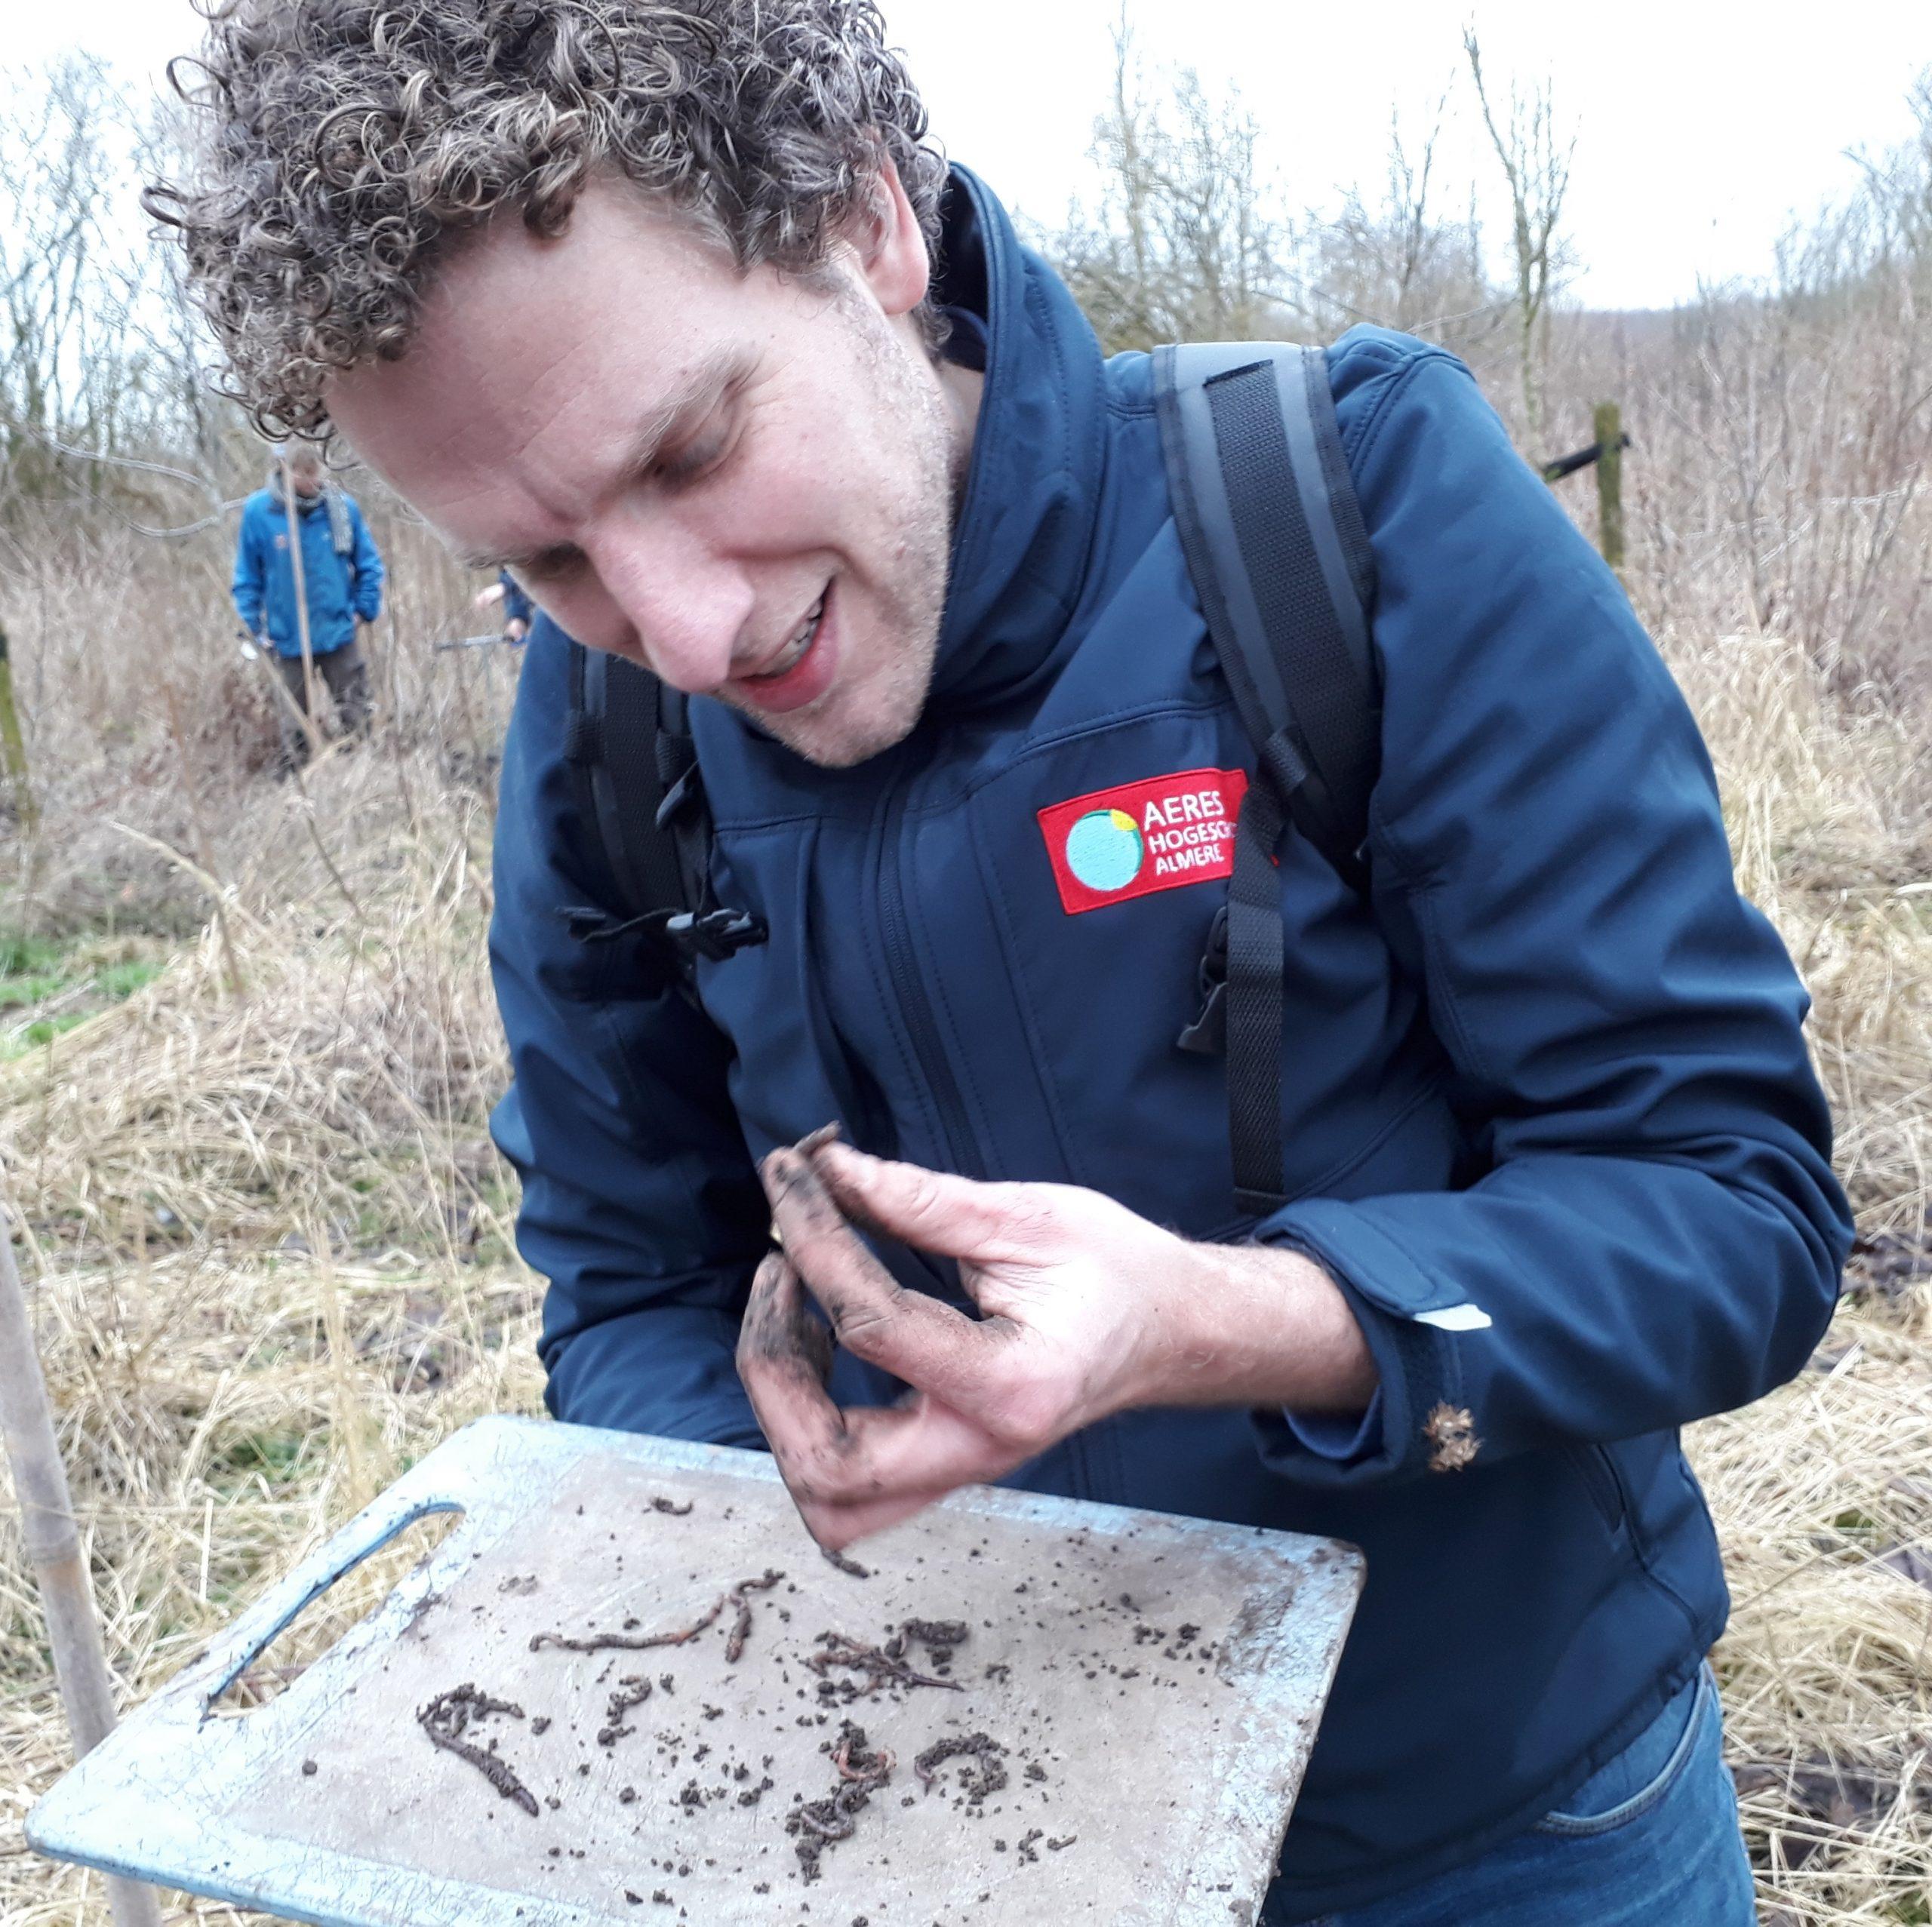 https://greendealvoedselbossen.nl/nationaal-monitoringsprogramma-voedselbossen/